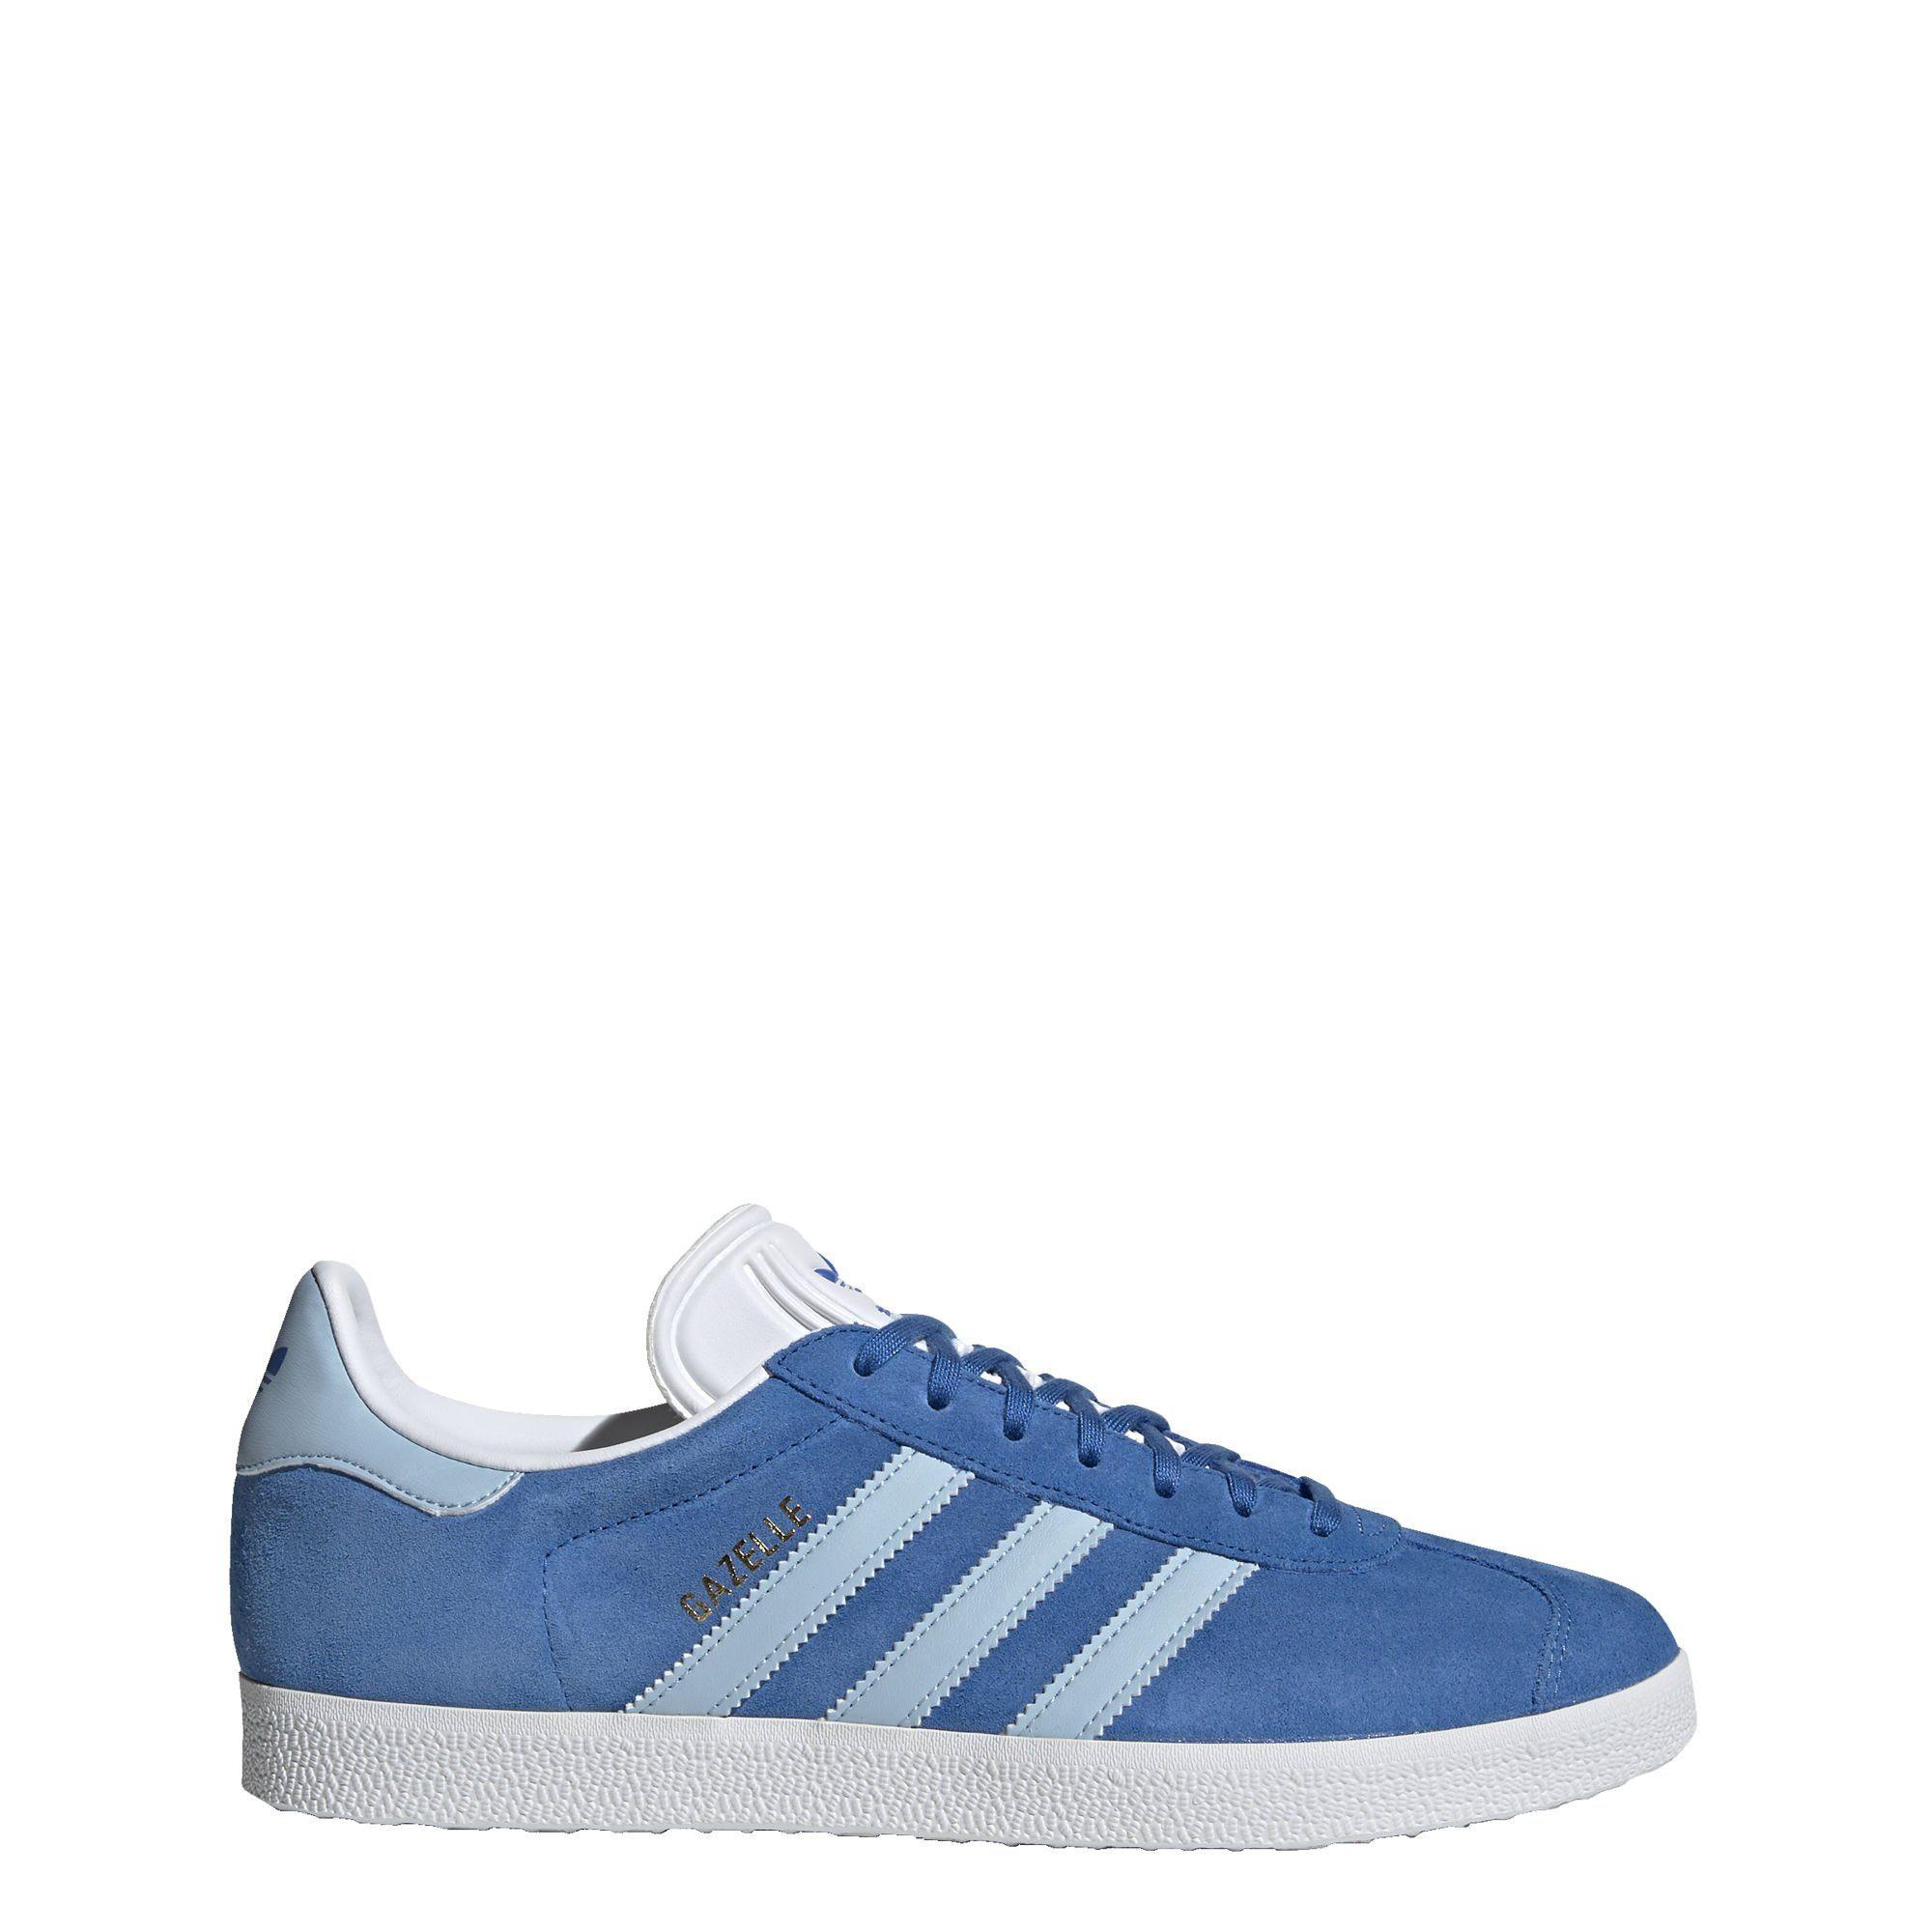 Originals Schuh« »gazelle Gazelle;trefoil Sneaker Adidas ulF1cJTK3